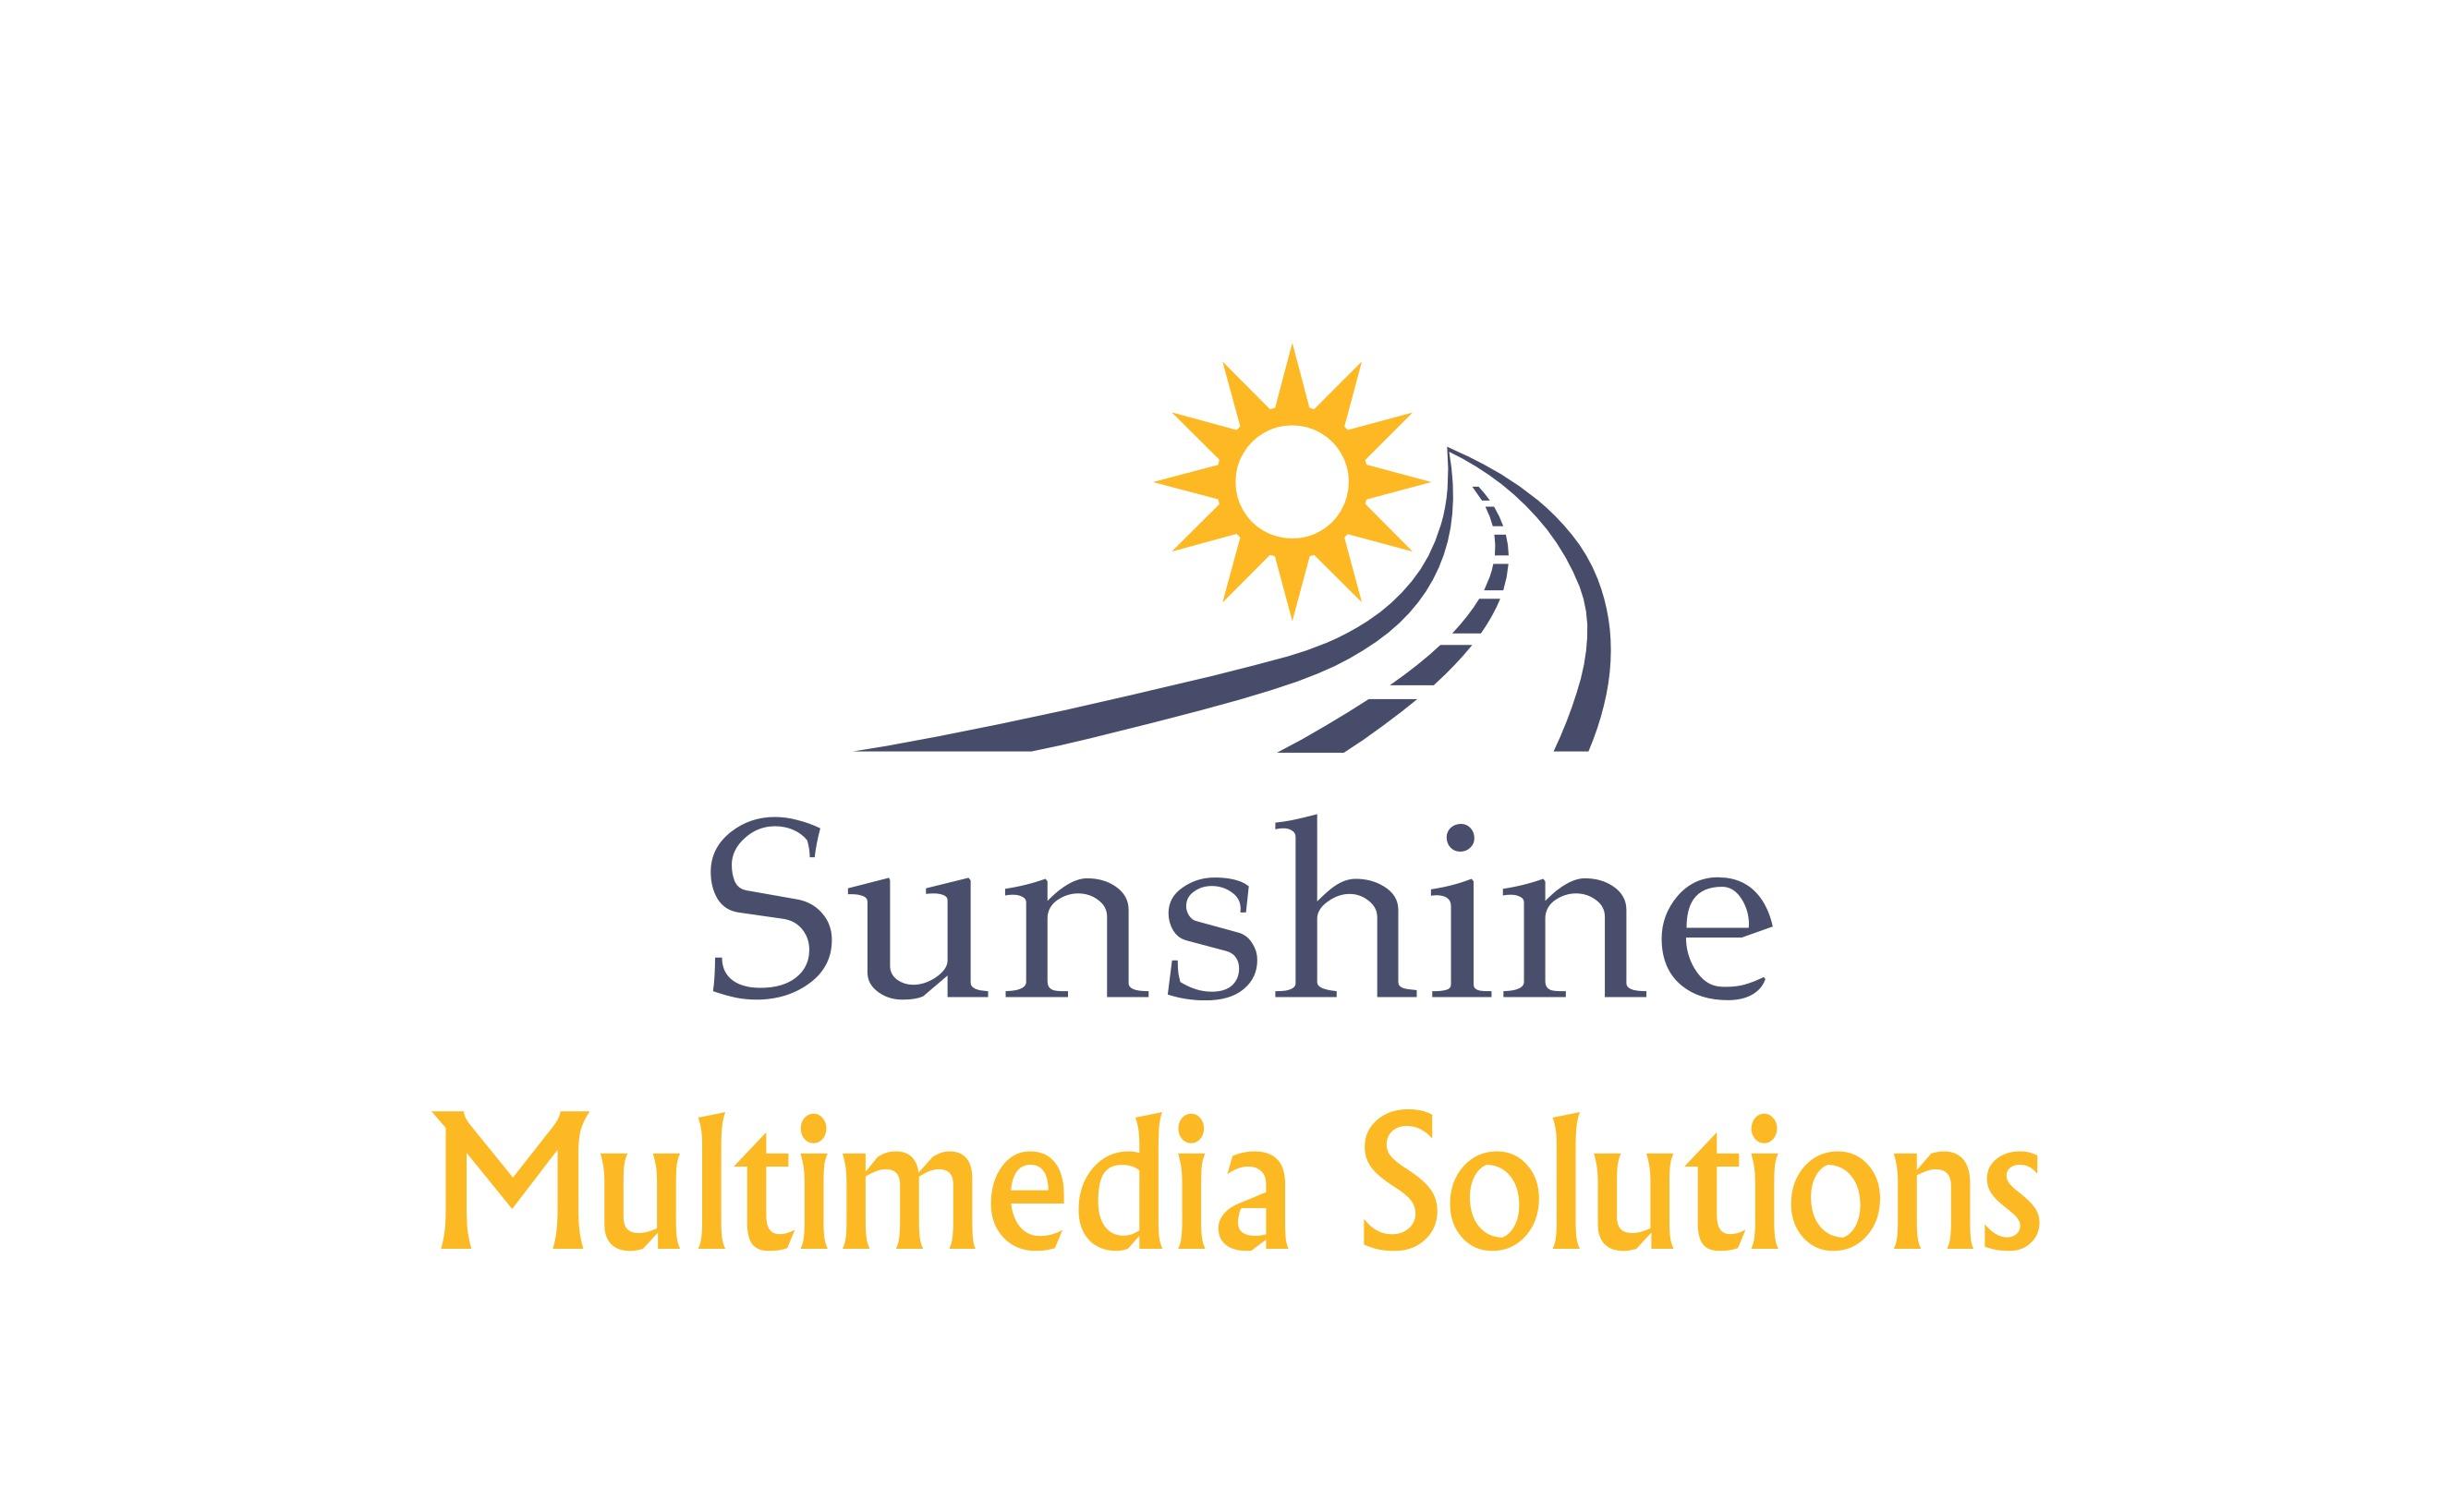 Sunshine Multimedia Solutions